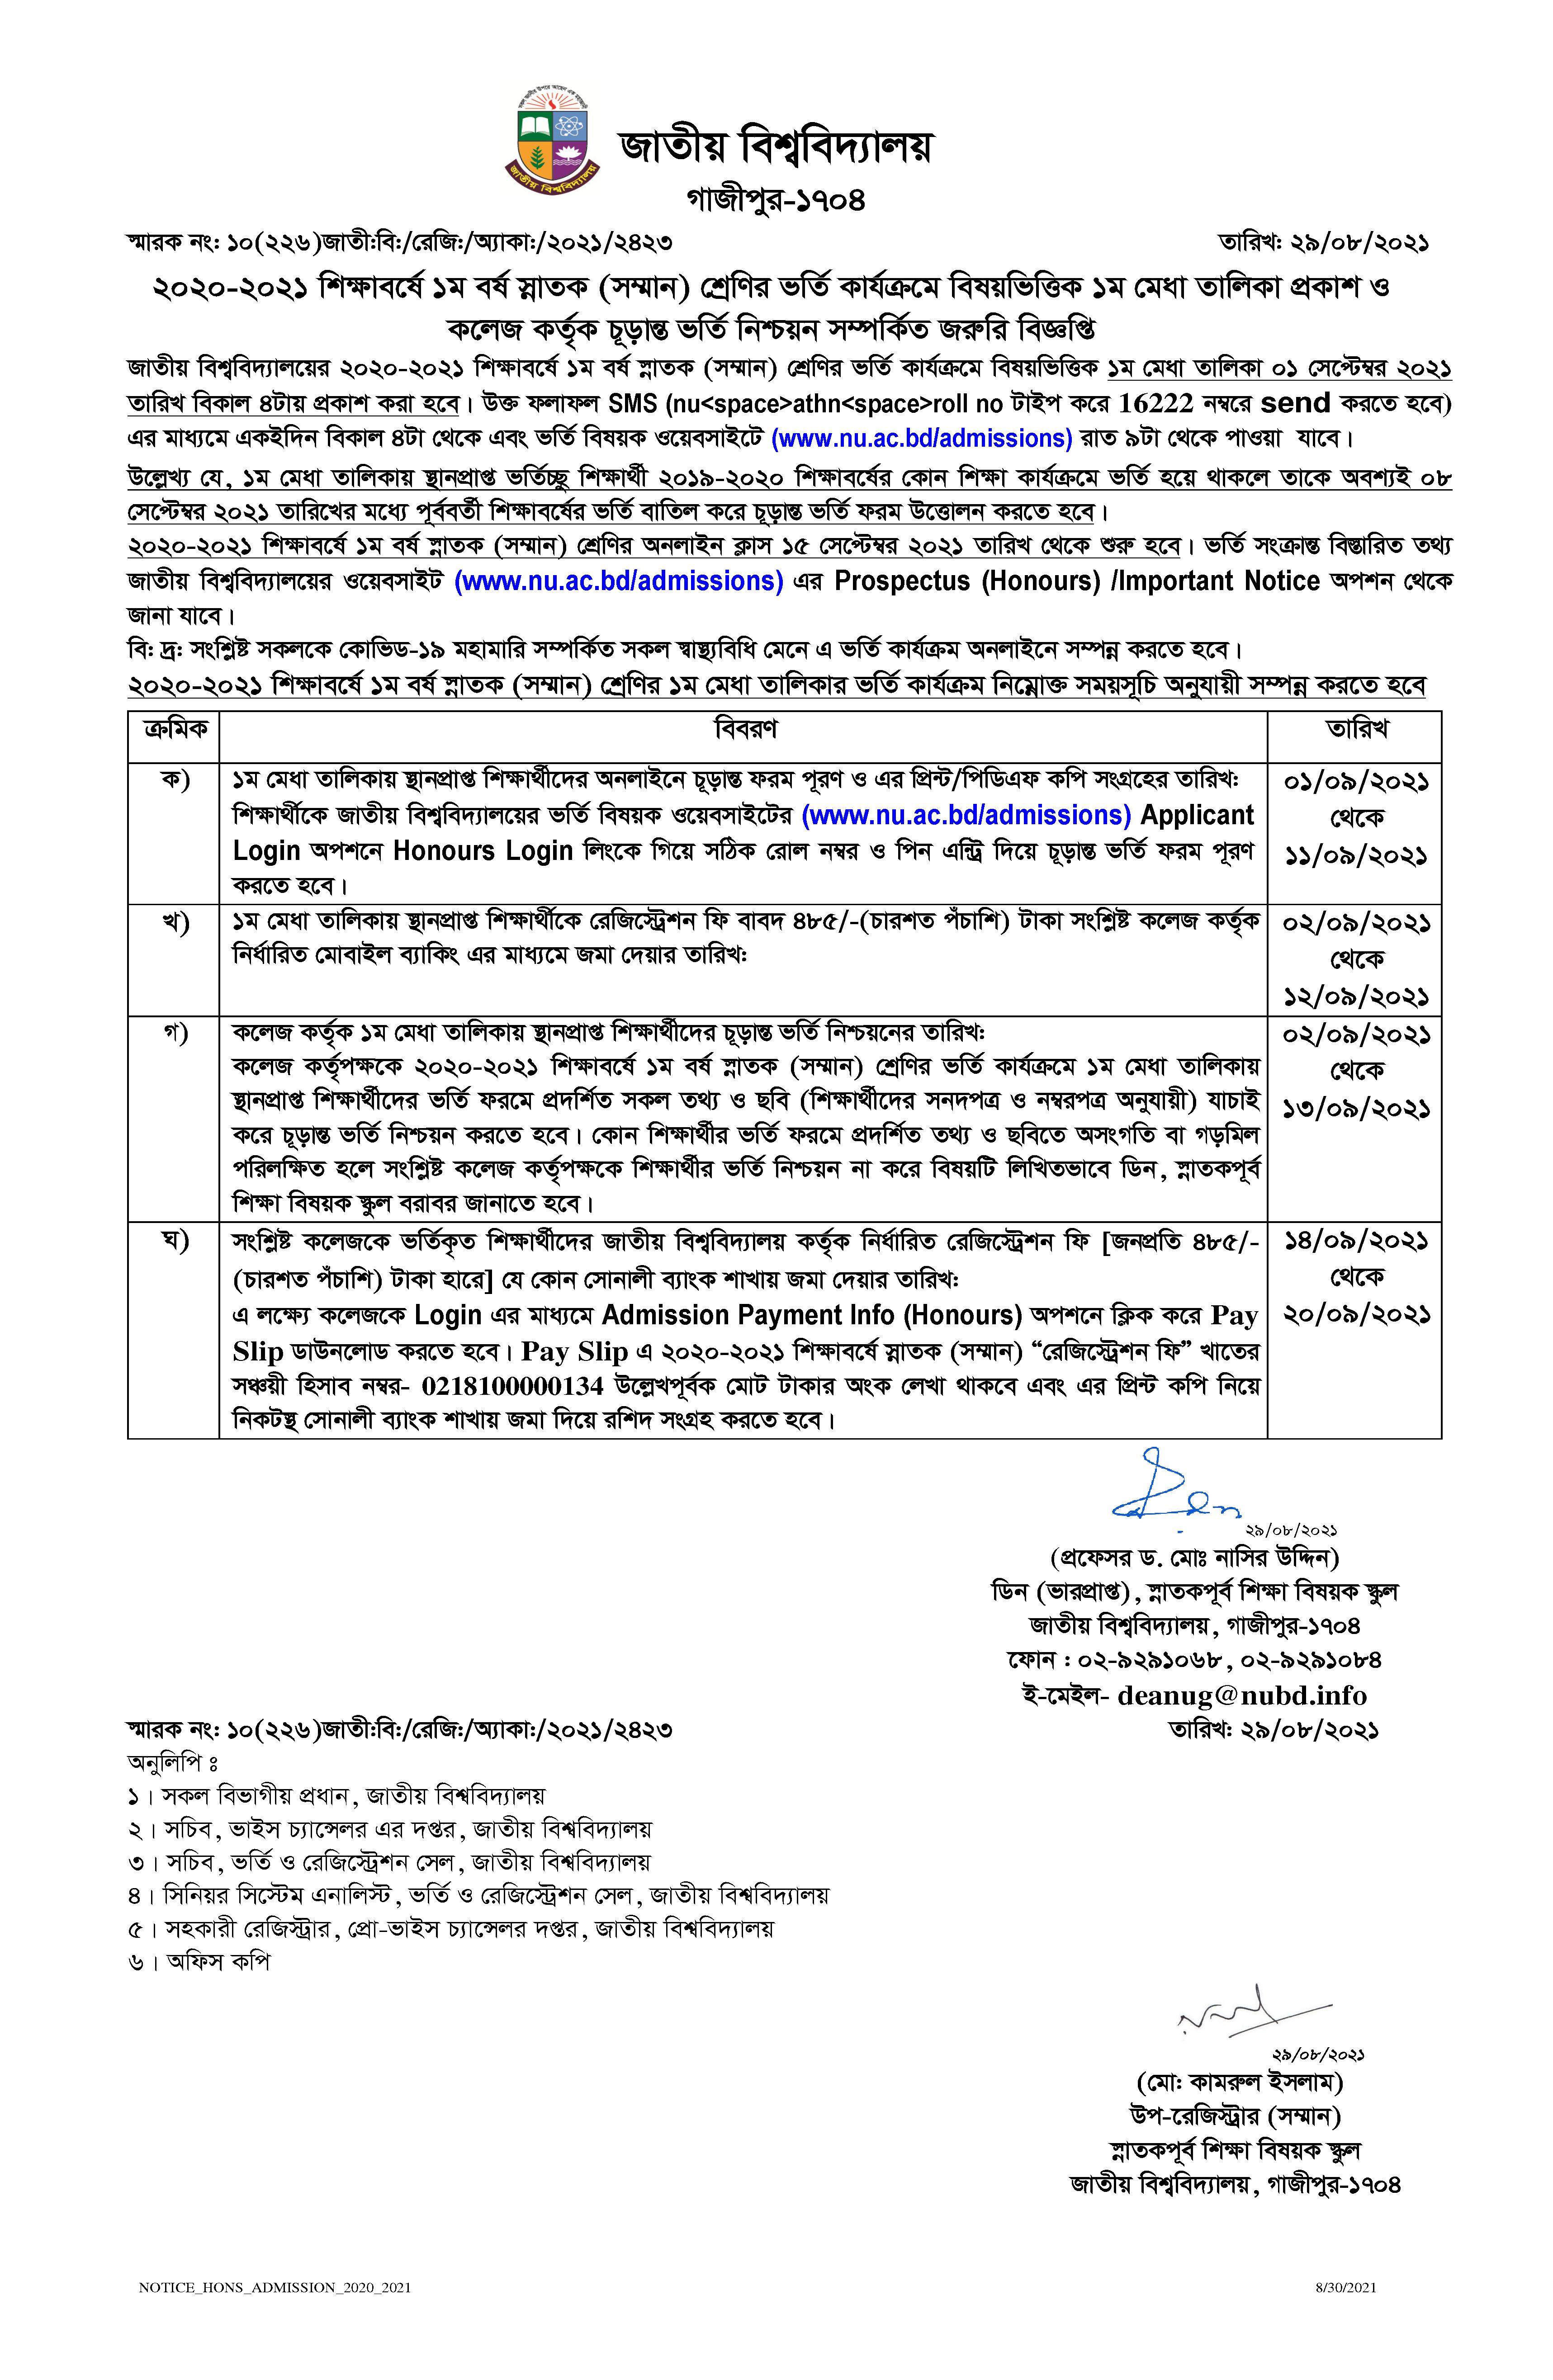 NU Admission Result 2021 Merit List for 1st Year Honours Admission